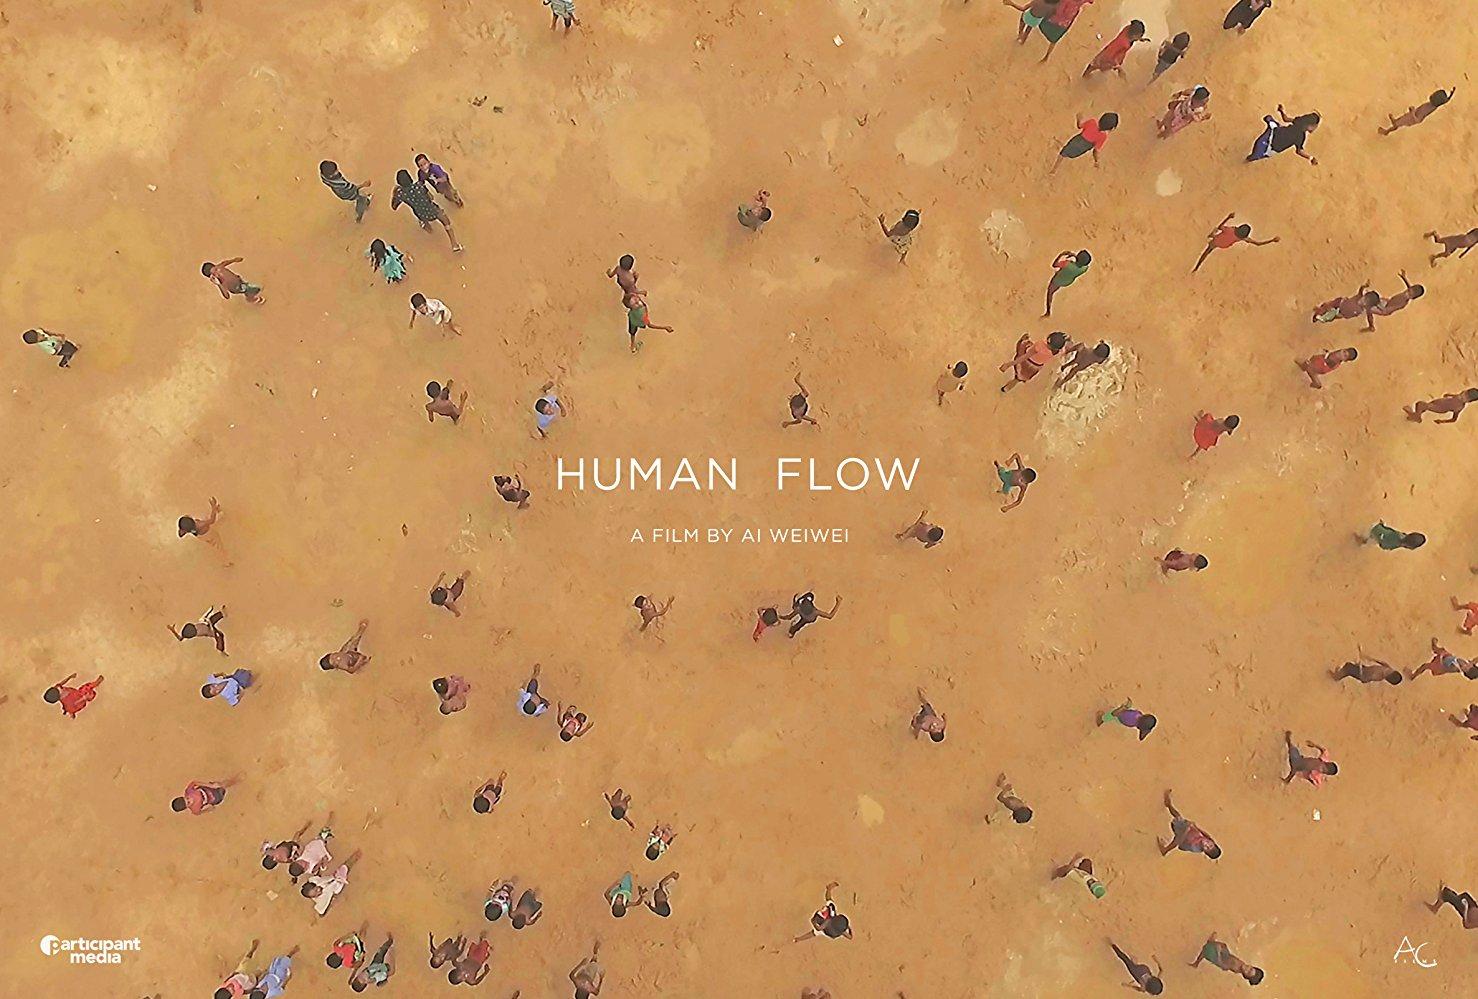 <b>HUMAN FLOW TRAILER...</b>